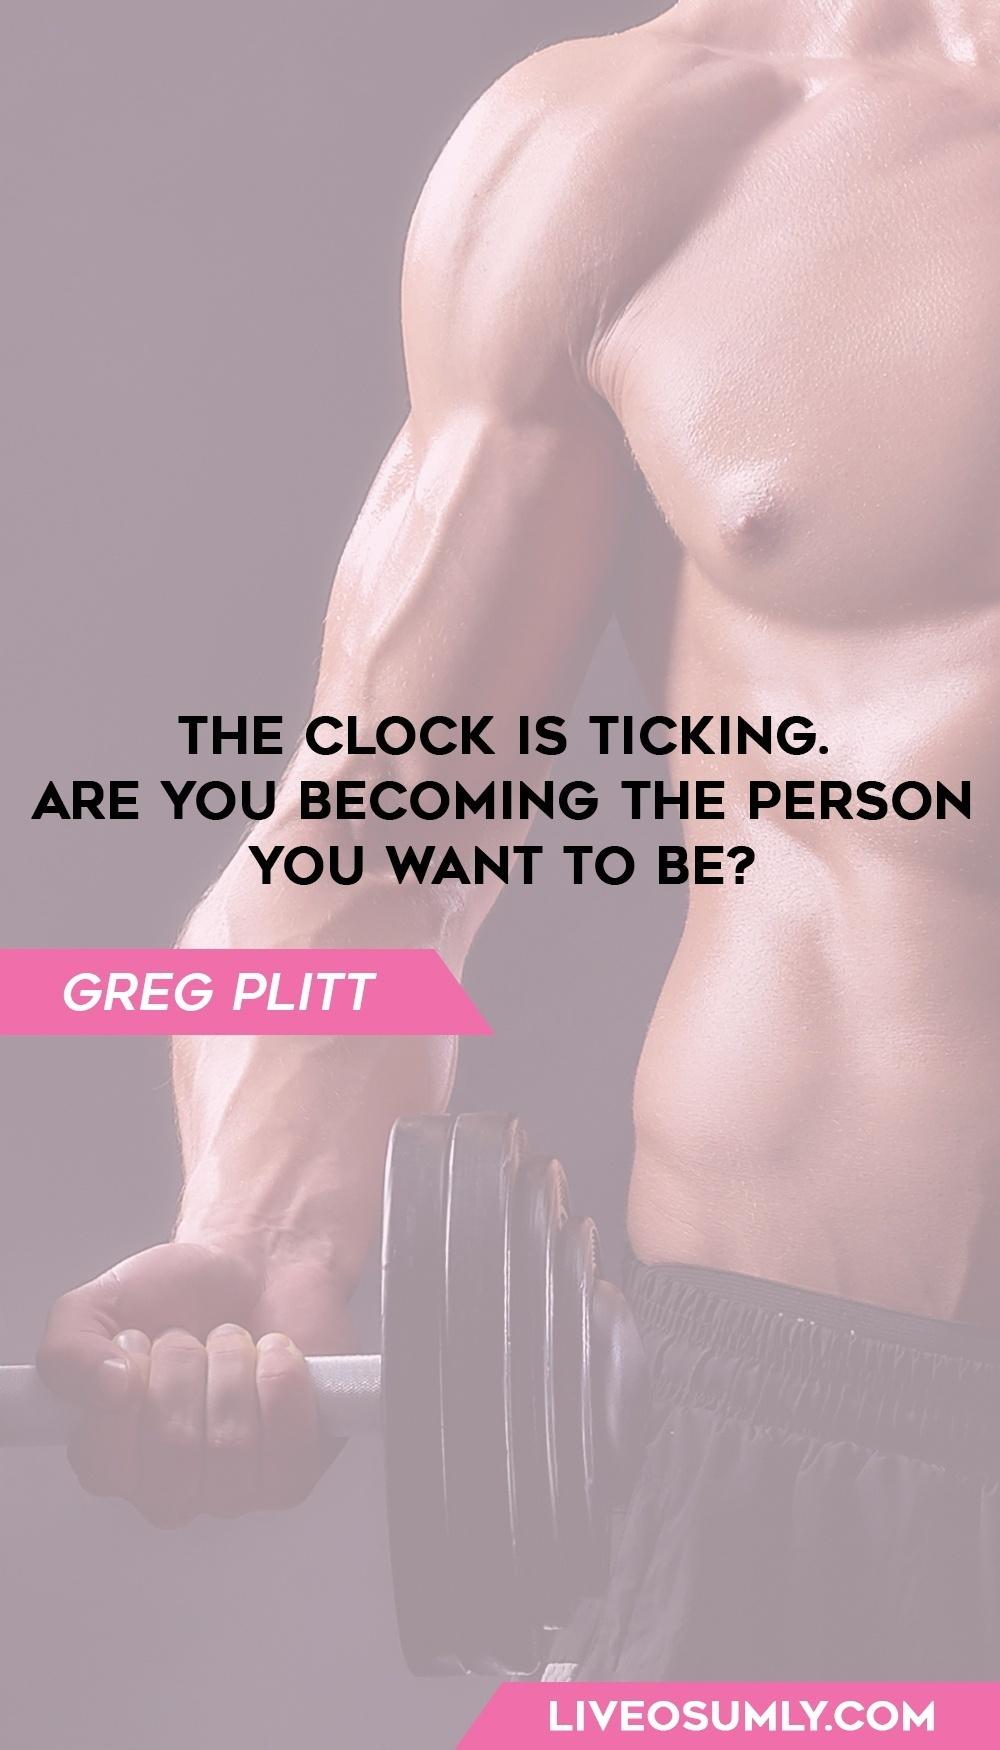 34. Greg Plitt Quotes on Fitness